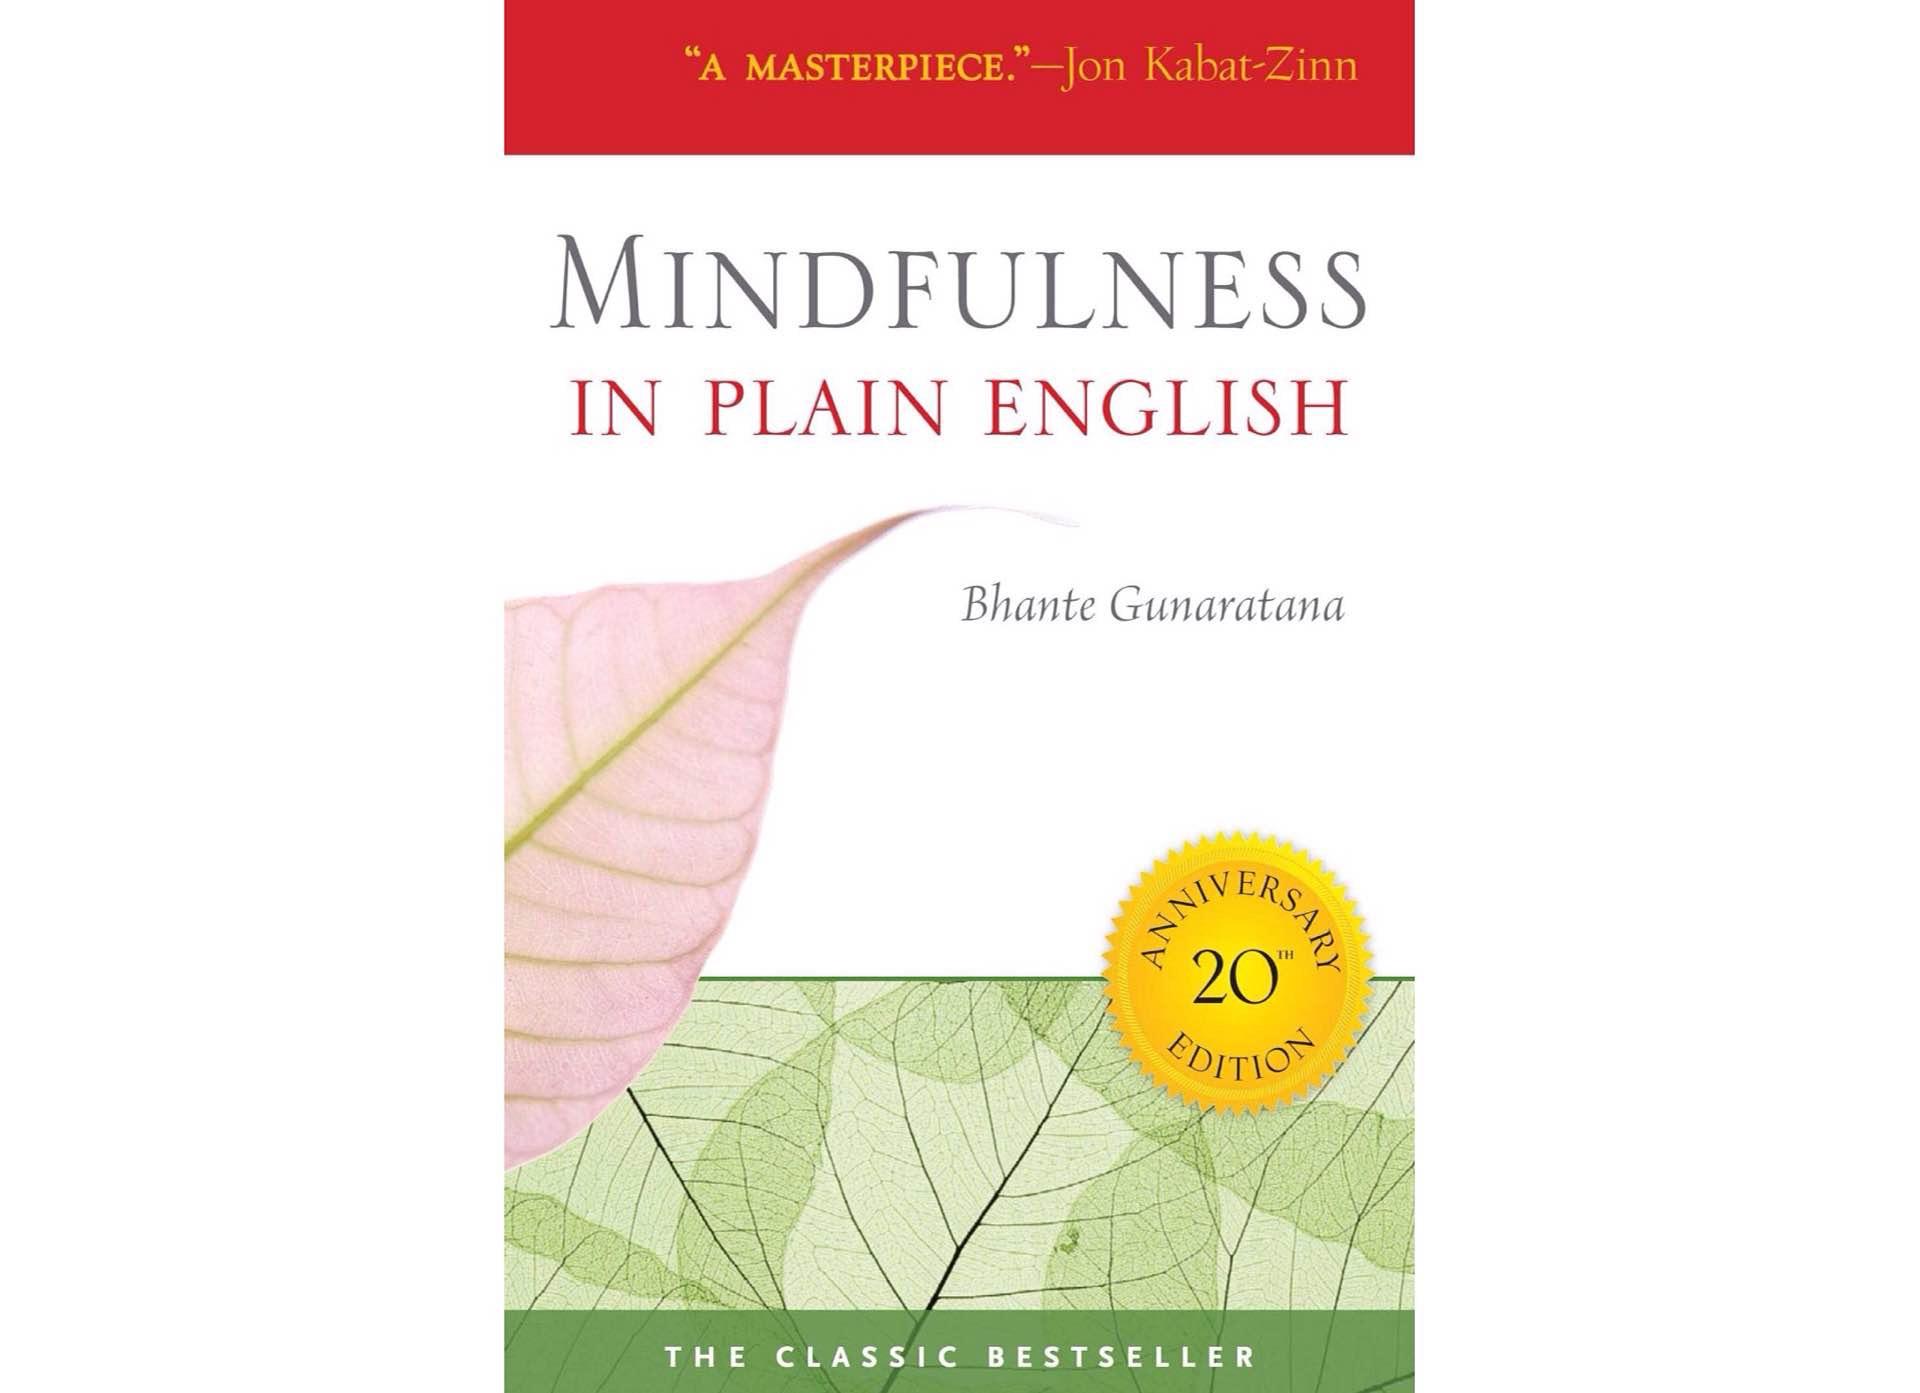 Mindfulness in Plain English by Bhante Gunaratana.